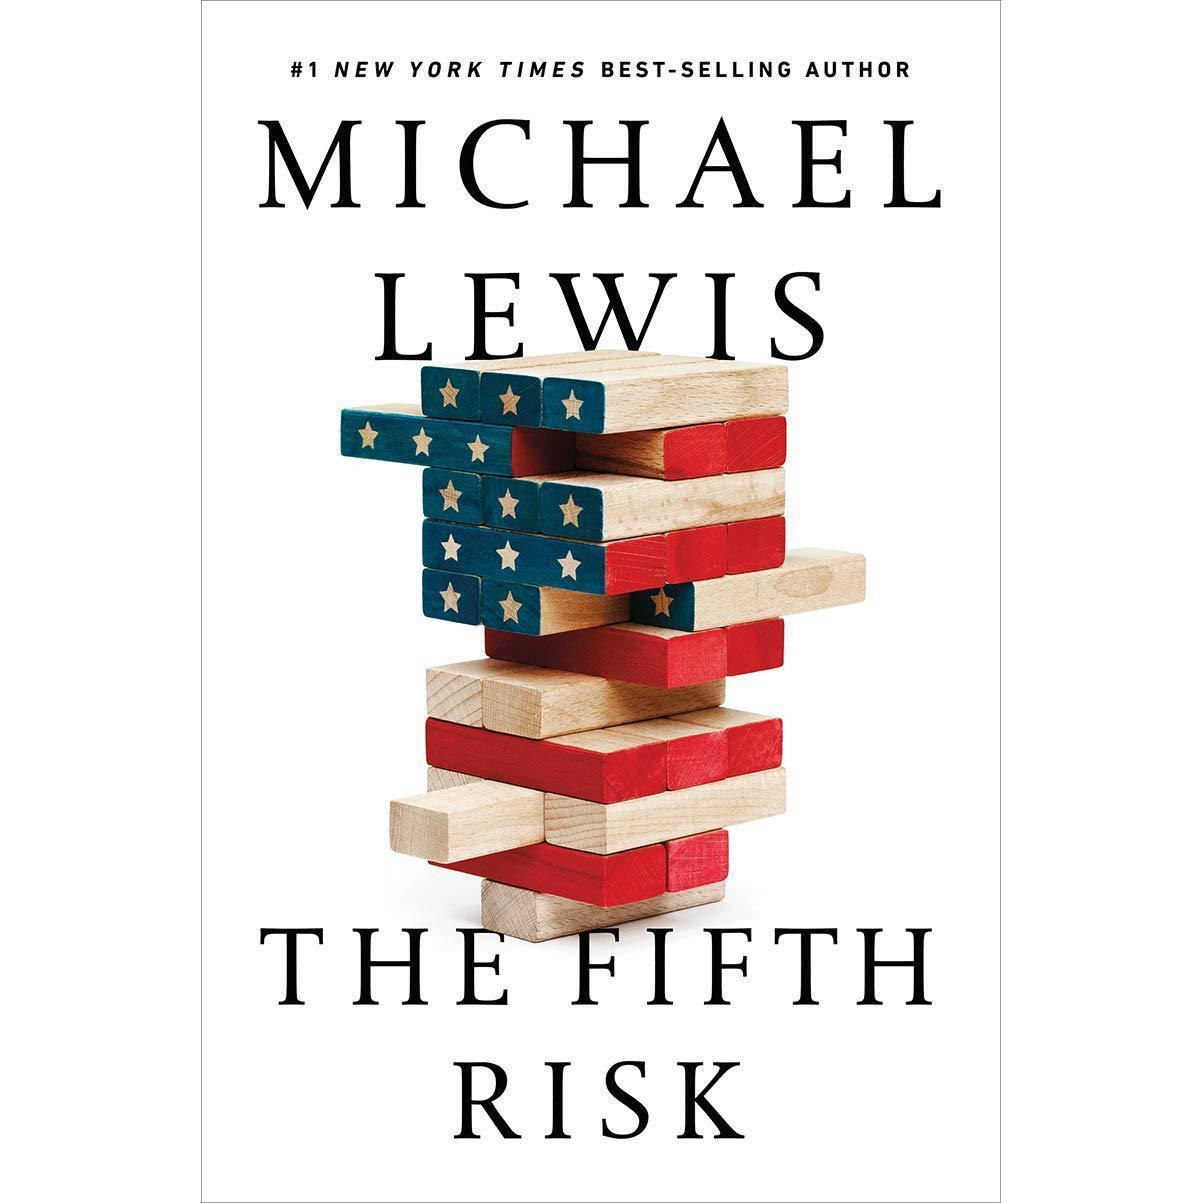 The Fifth Risk by Michael Lewis [E BOOK] [PDF/MOBI/EPUB]